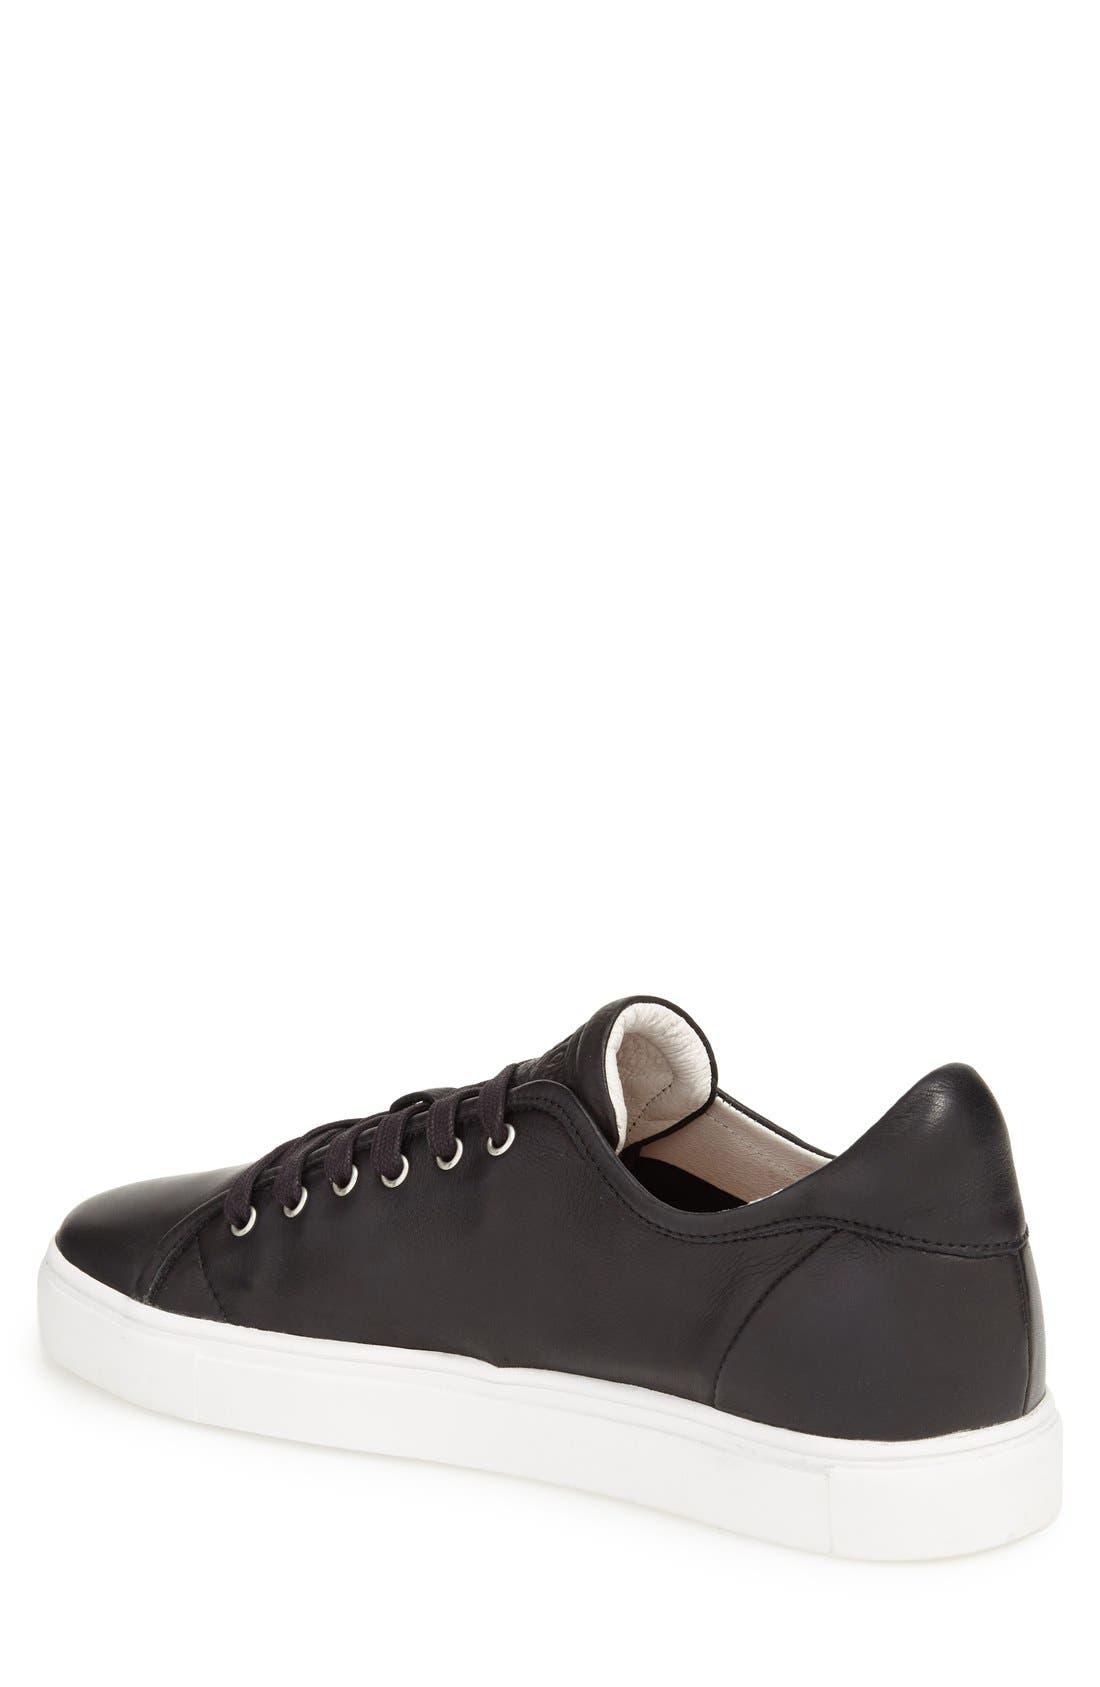 Blacktone 'LM24' Sneaker,                             Alternate thumbnail 2, color,                             001